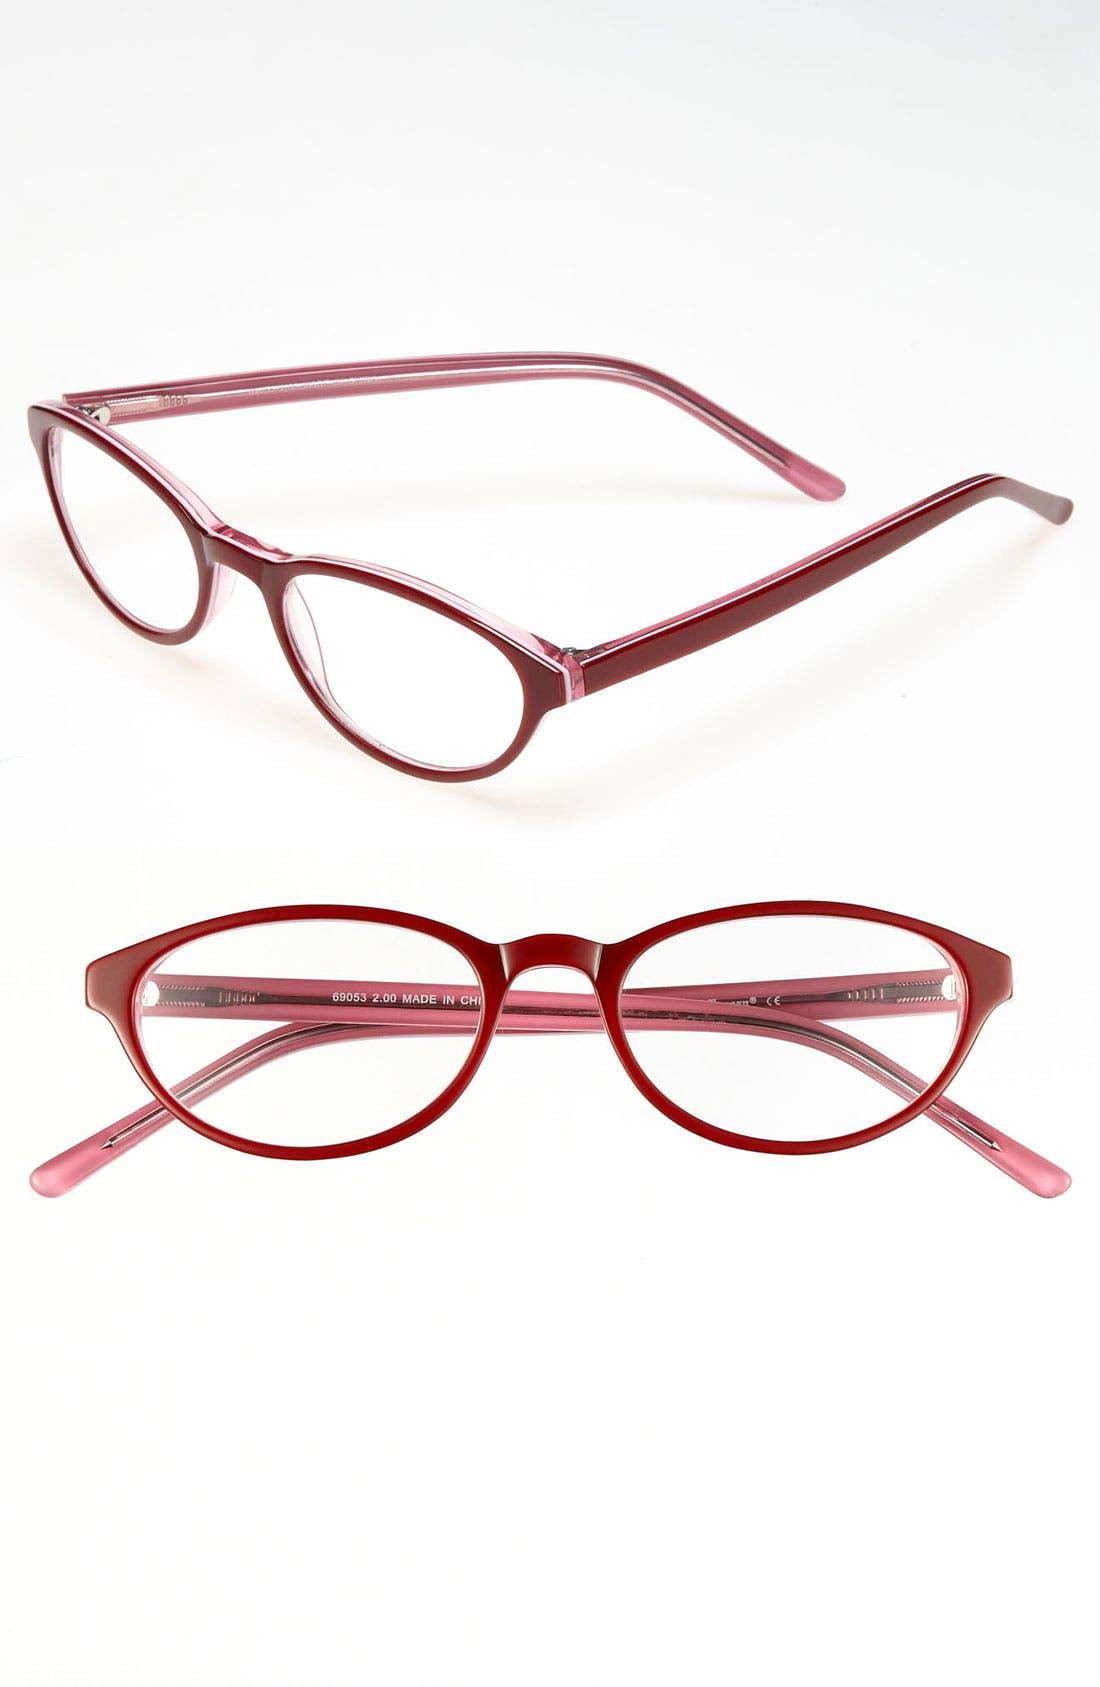 Alternate Image 1 Selected - A.J. Morgan Reading Glasses